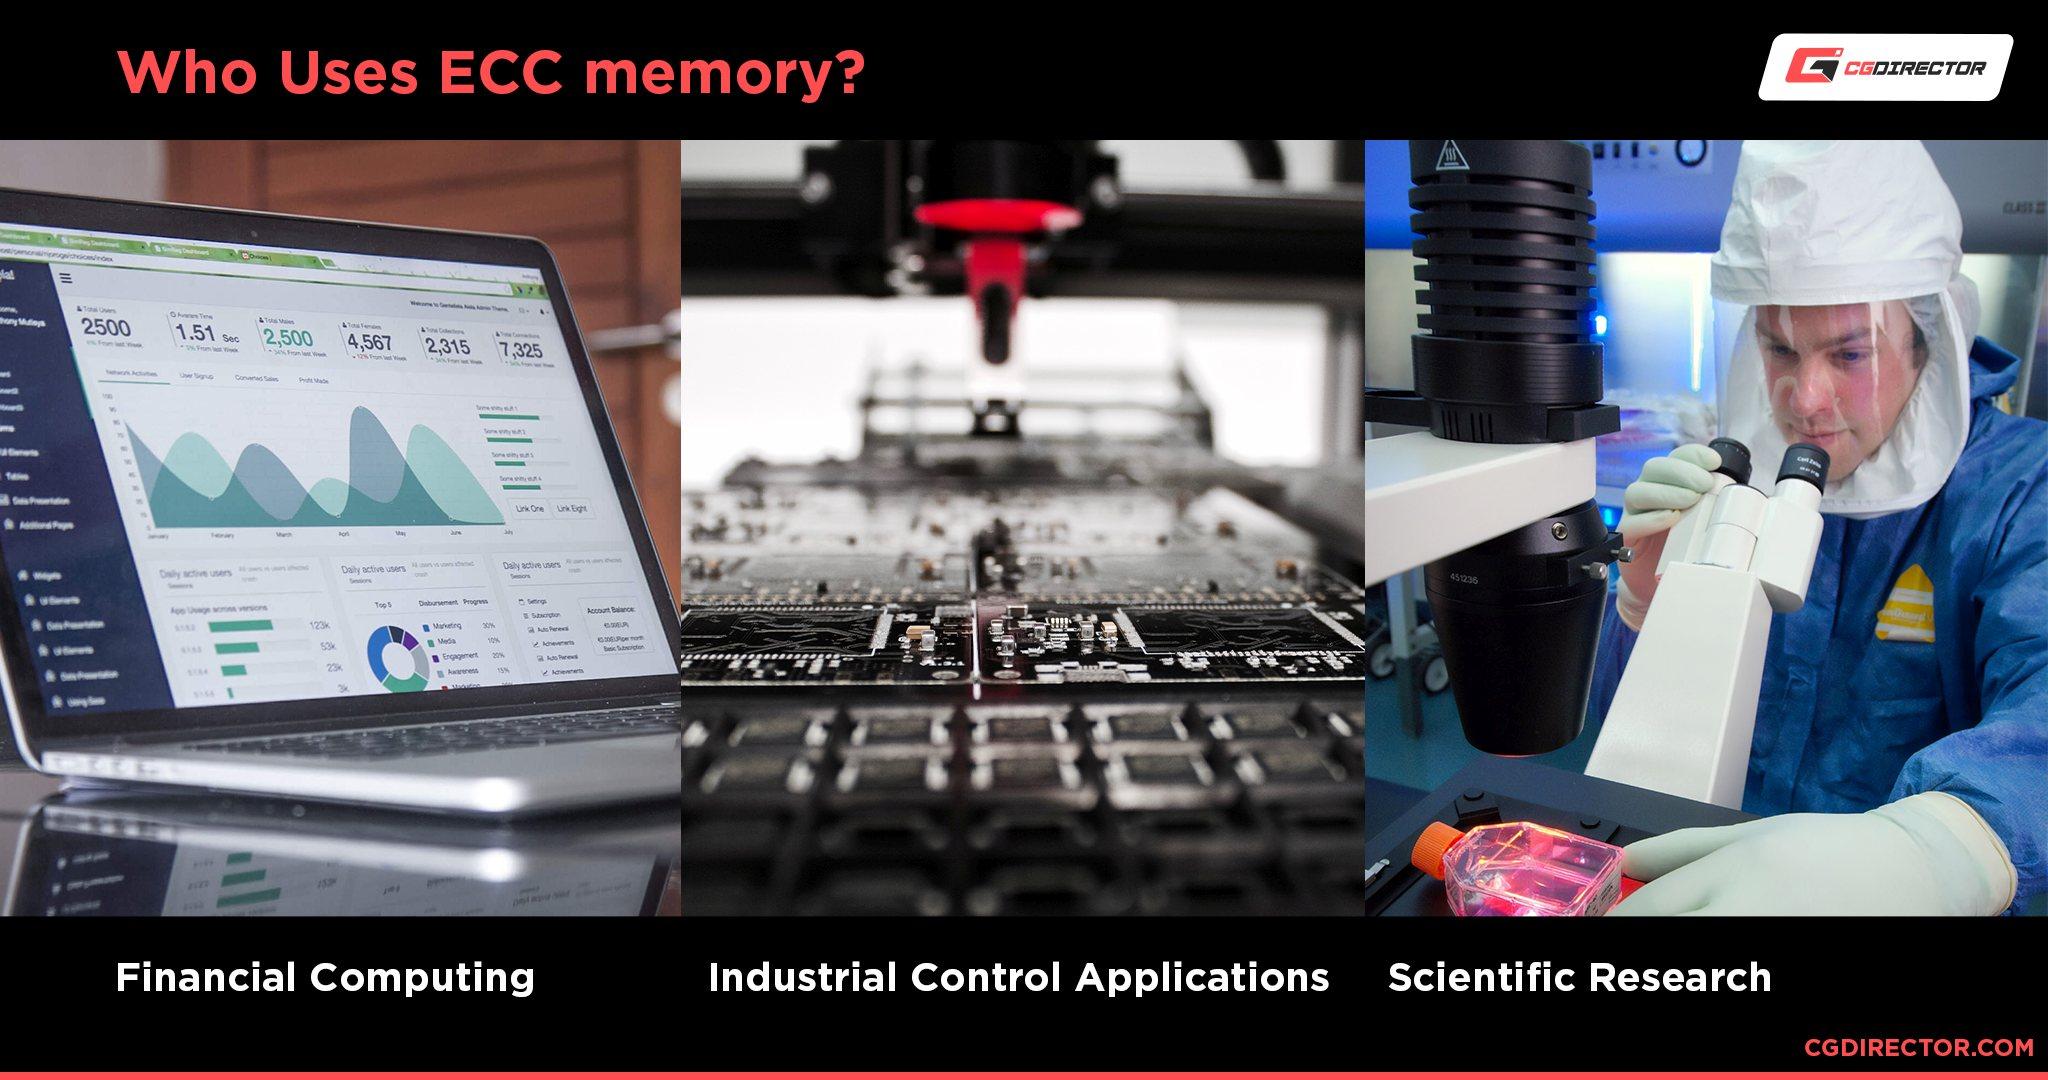 Who uses ECC memory